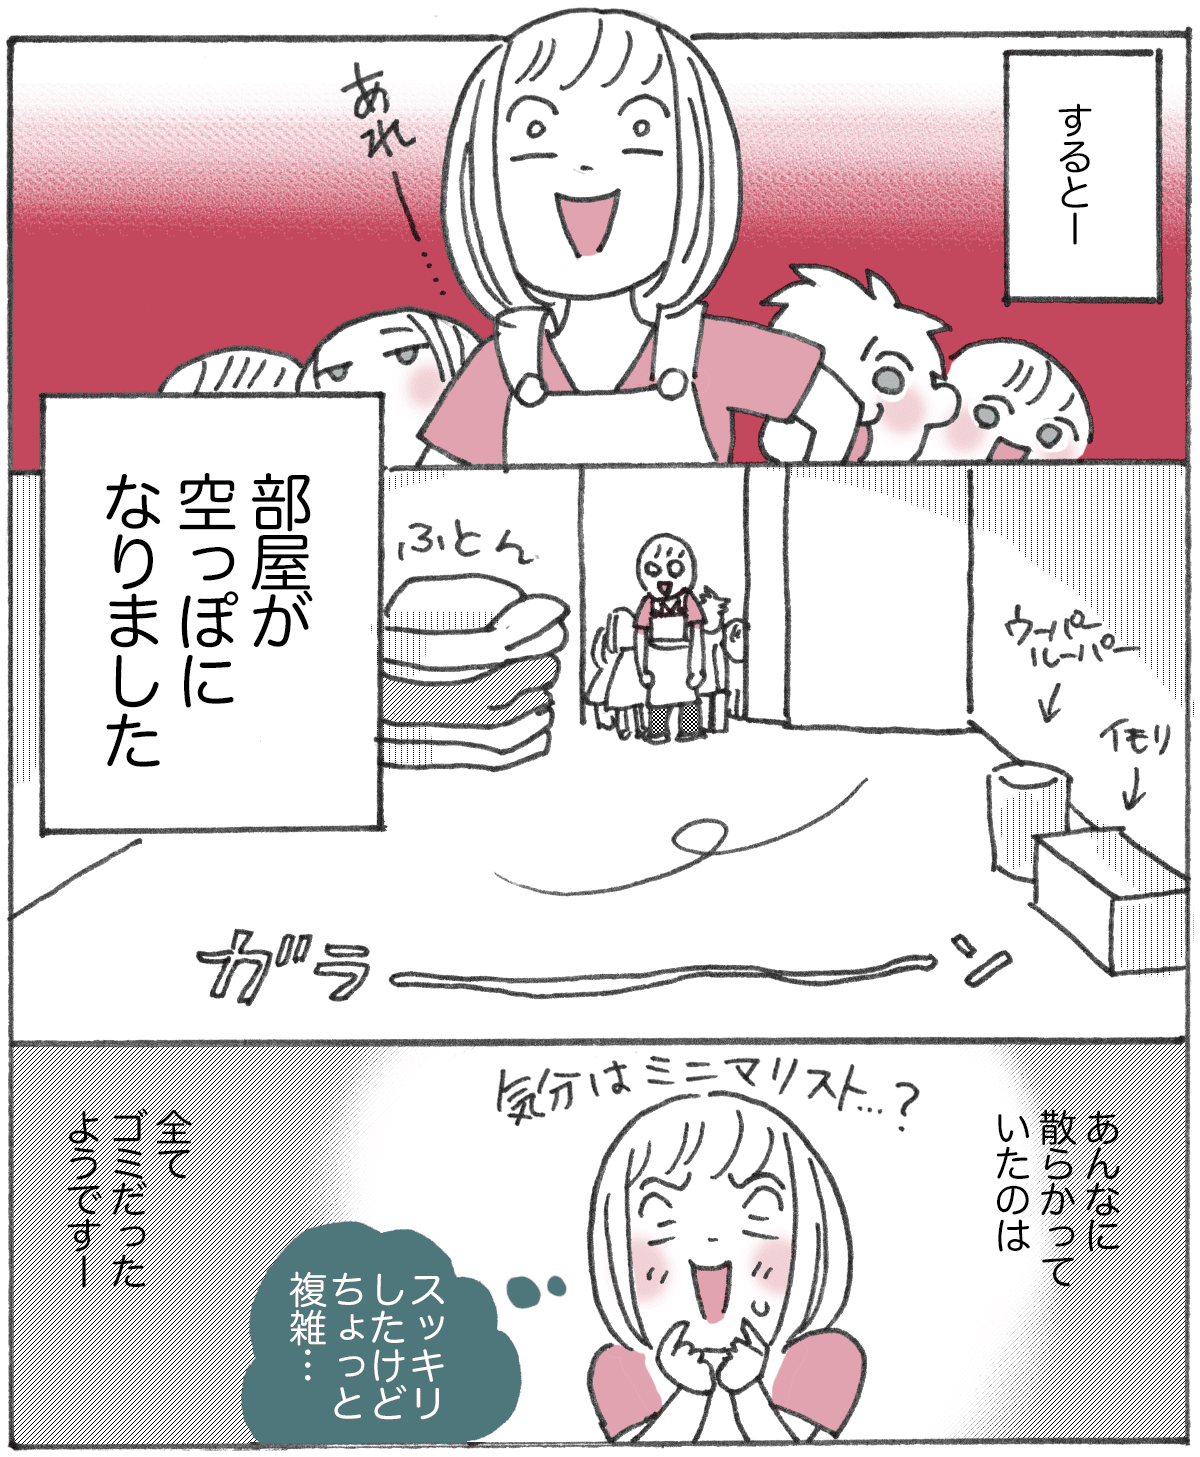 MK4_06